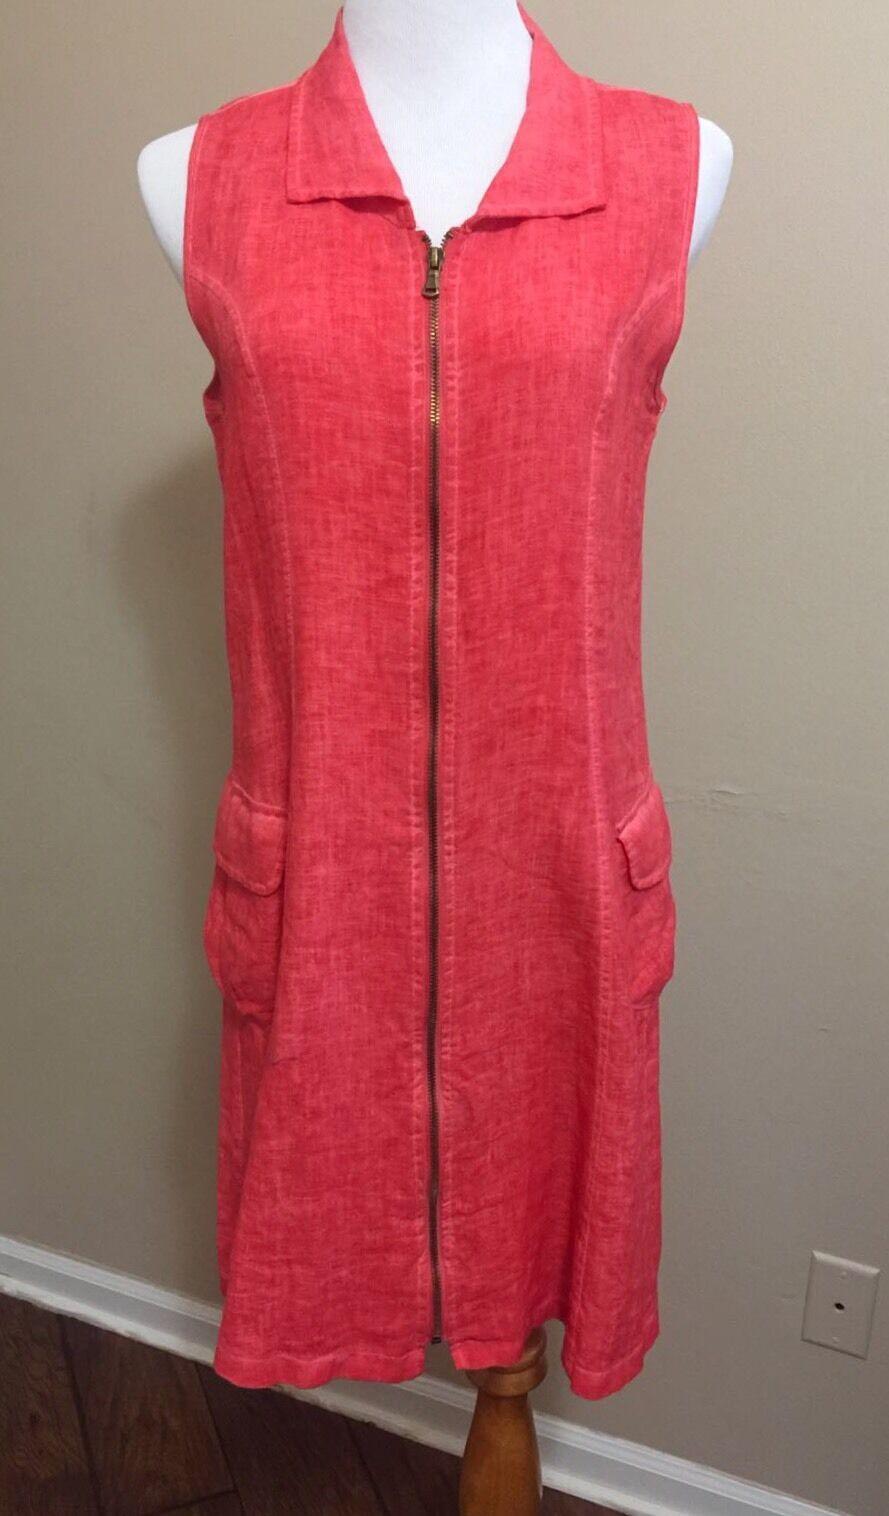 INIZIO orange Linen Dress Size M Shift Zippered Sleeveless Knee Length Casual